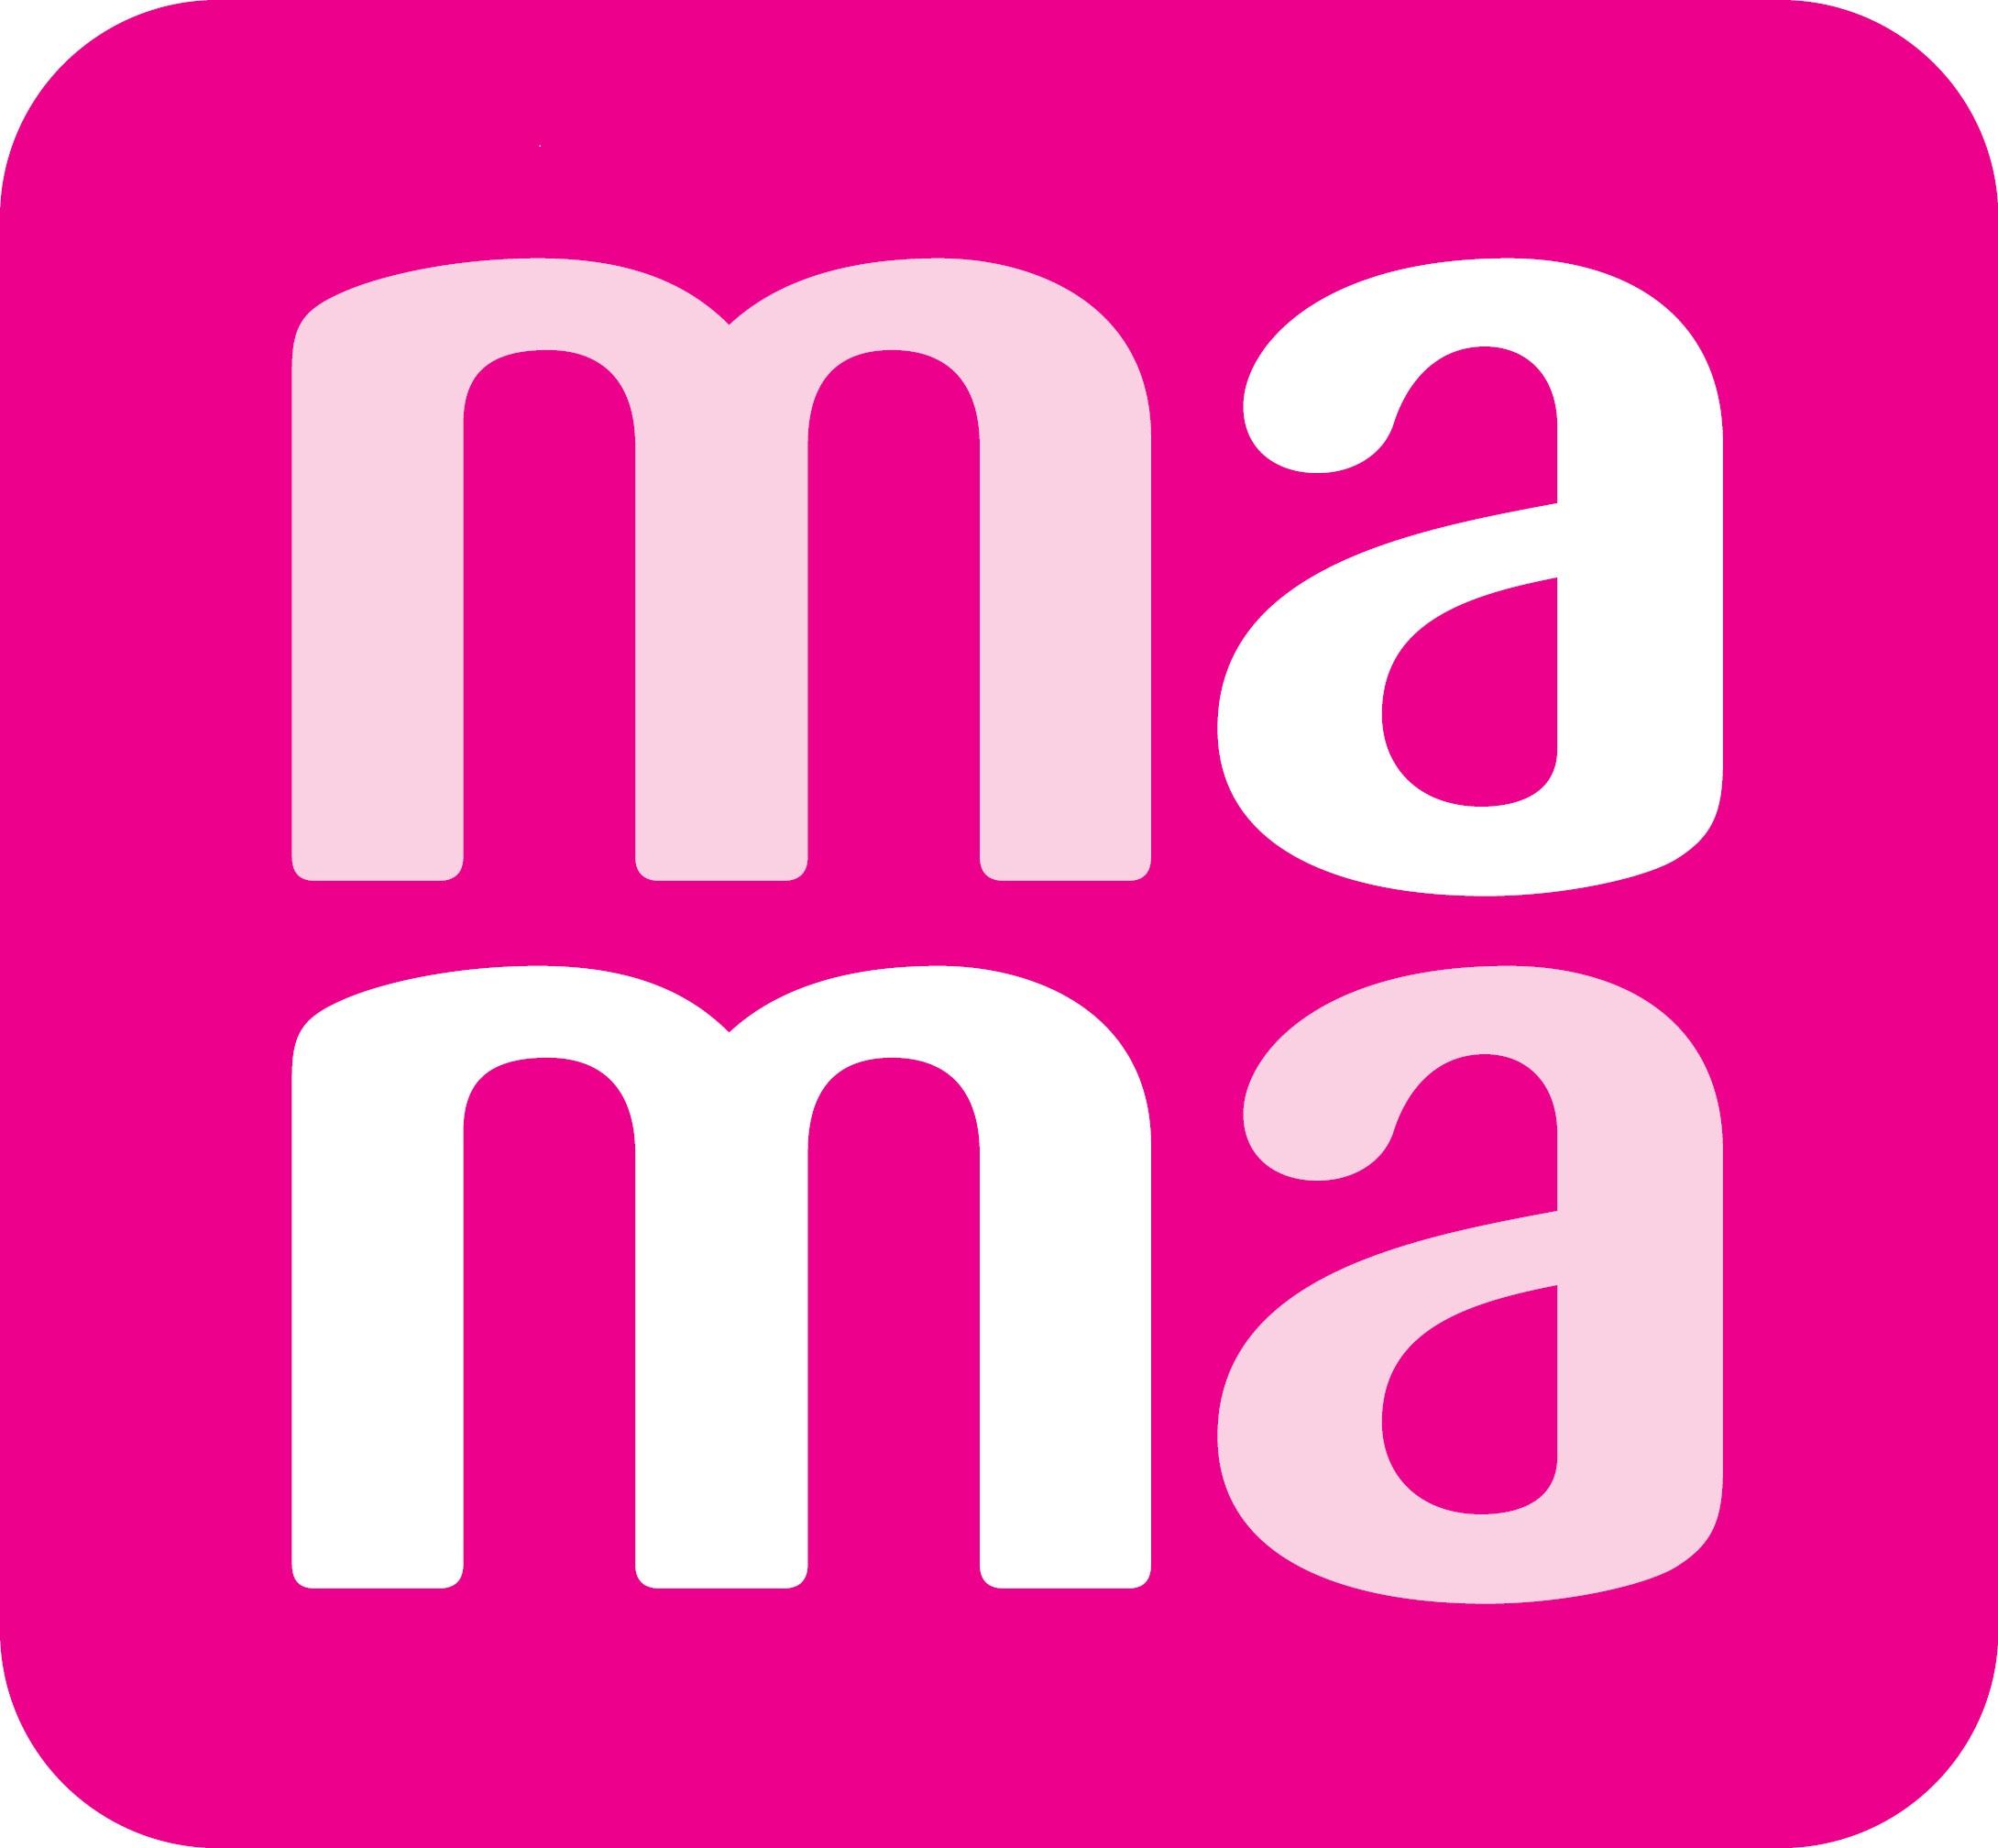 manaorg reviewer +30 2107295546 email: info@manaorgorg website: wwwmanaorgcom όροι & προϋποθέσεις ιστοσελίδας.